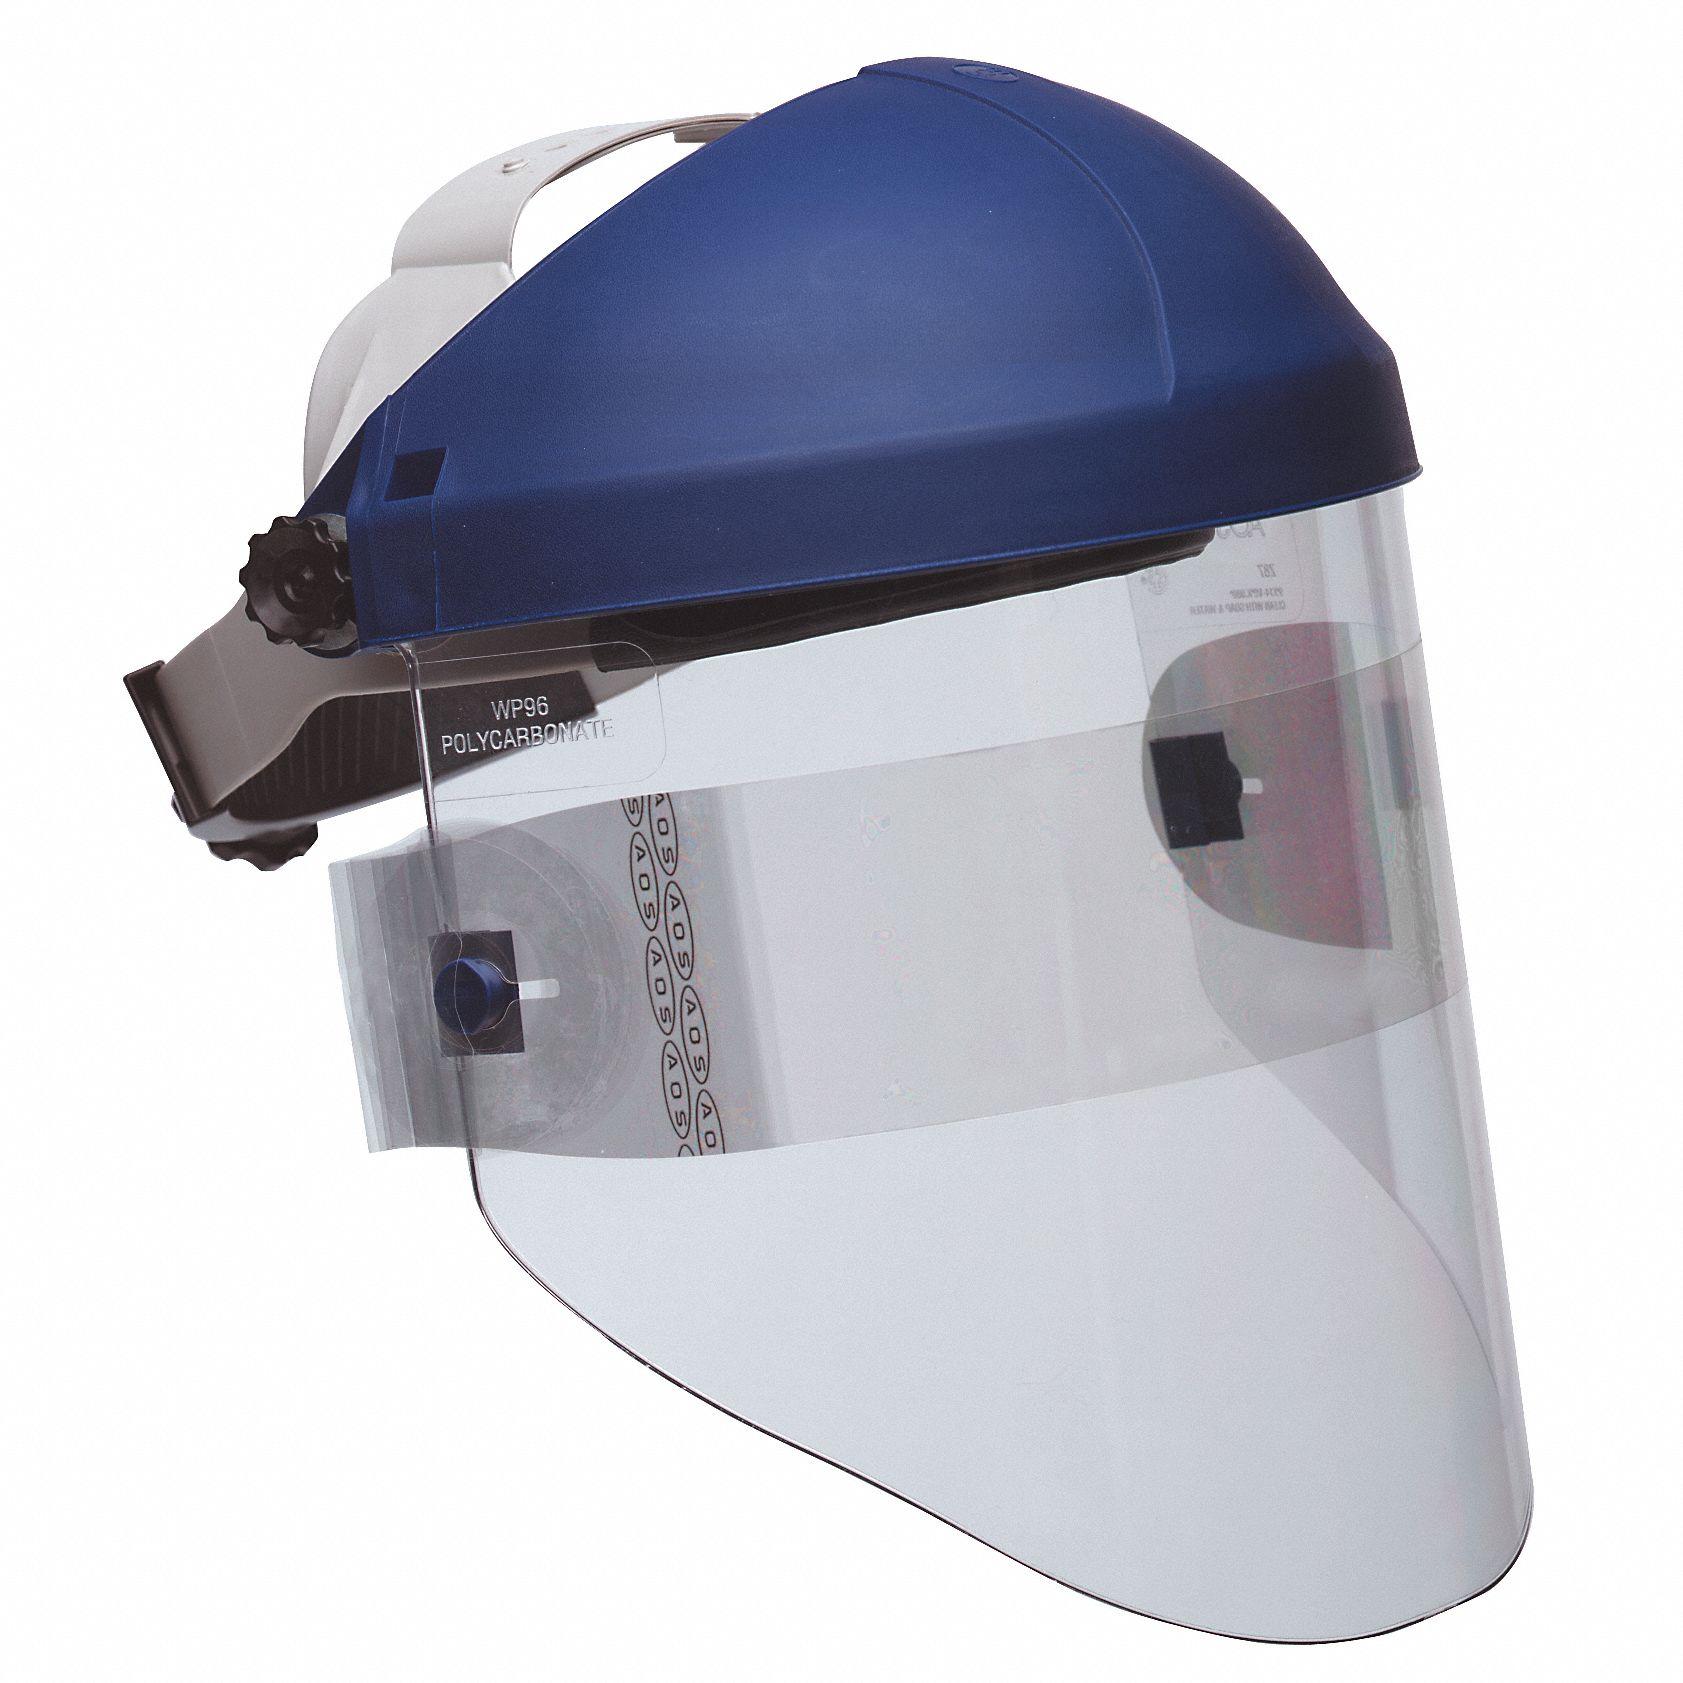 Transparent Welding Full Face Shield Protector Holder For Sparkproof